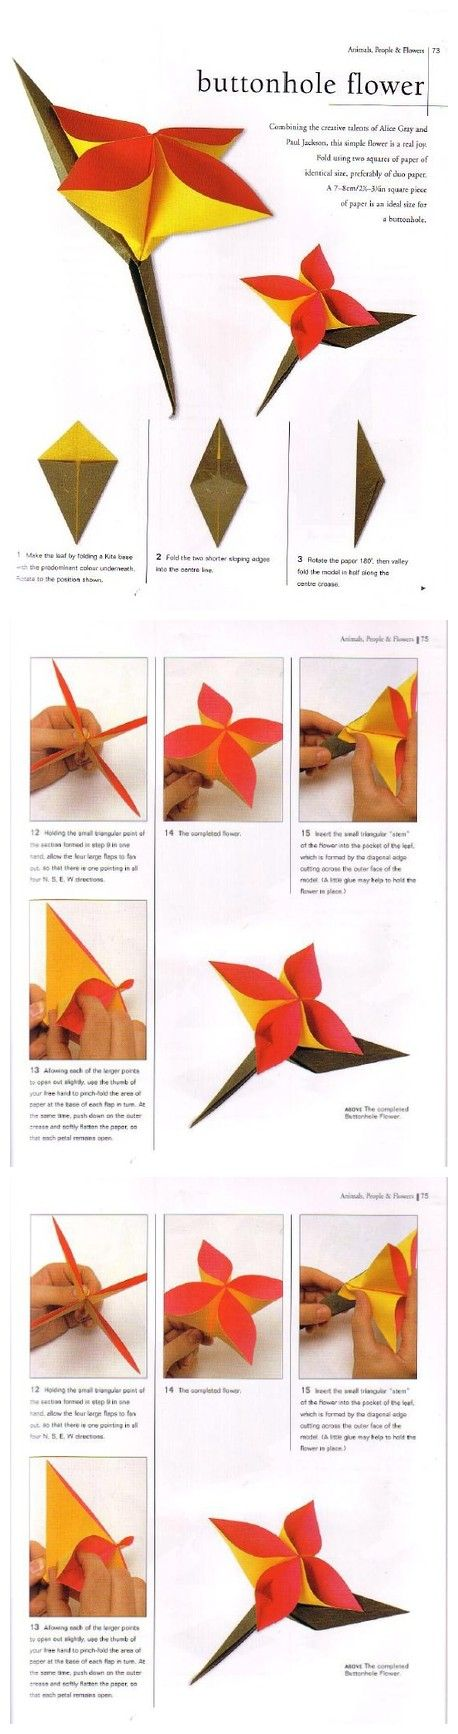 Origami Buttonhole Flower